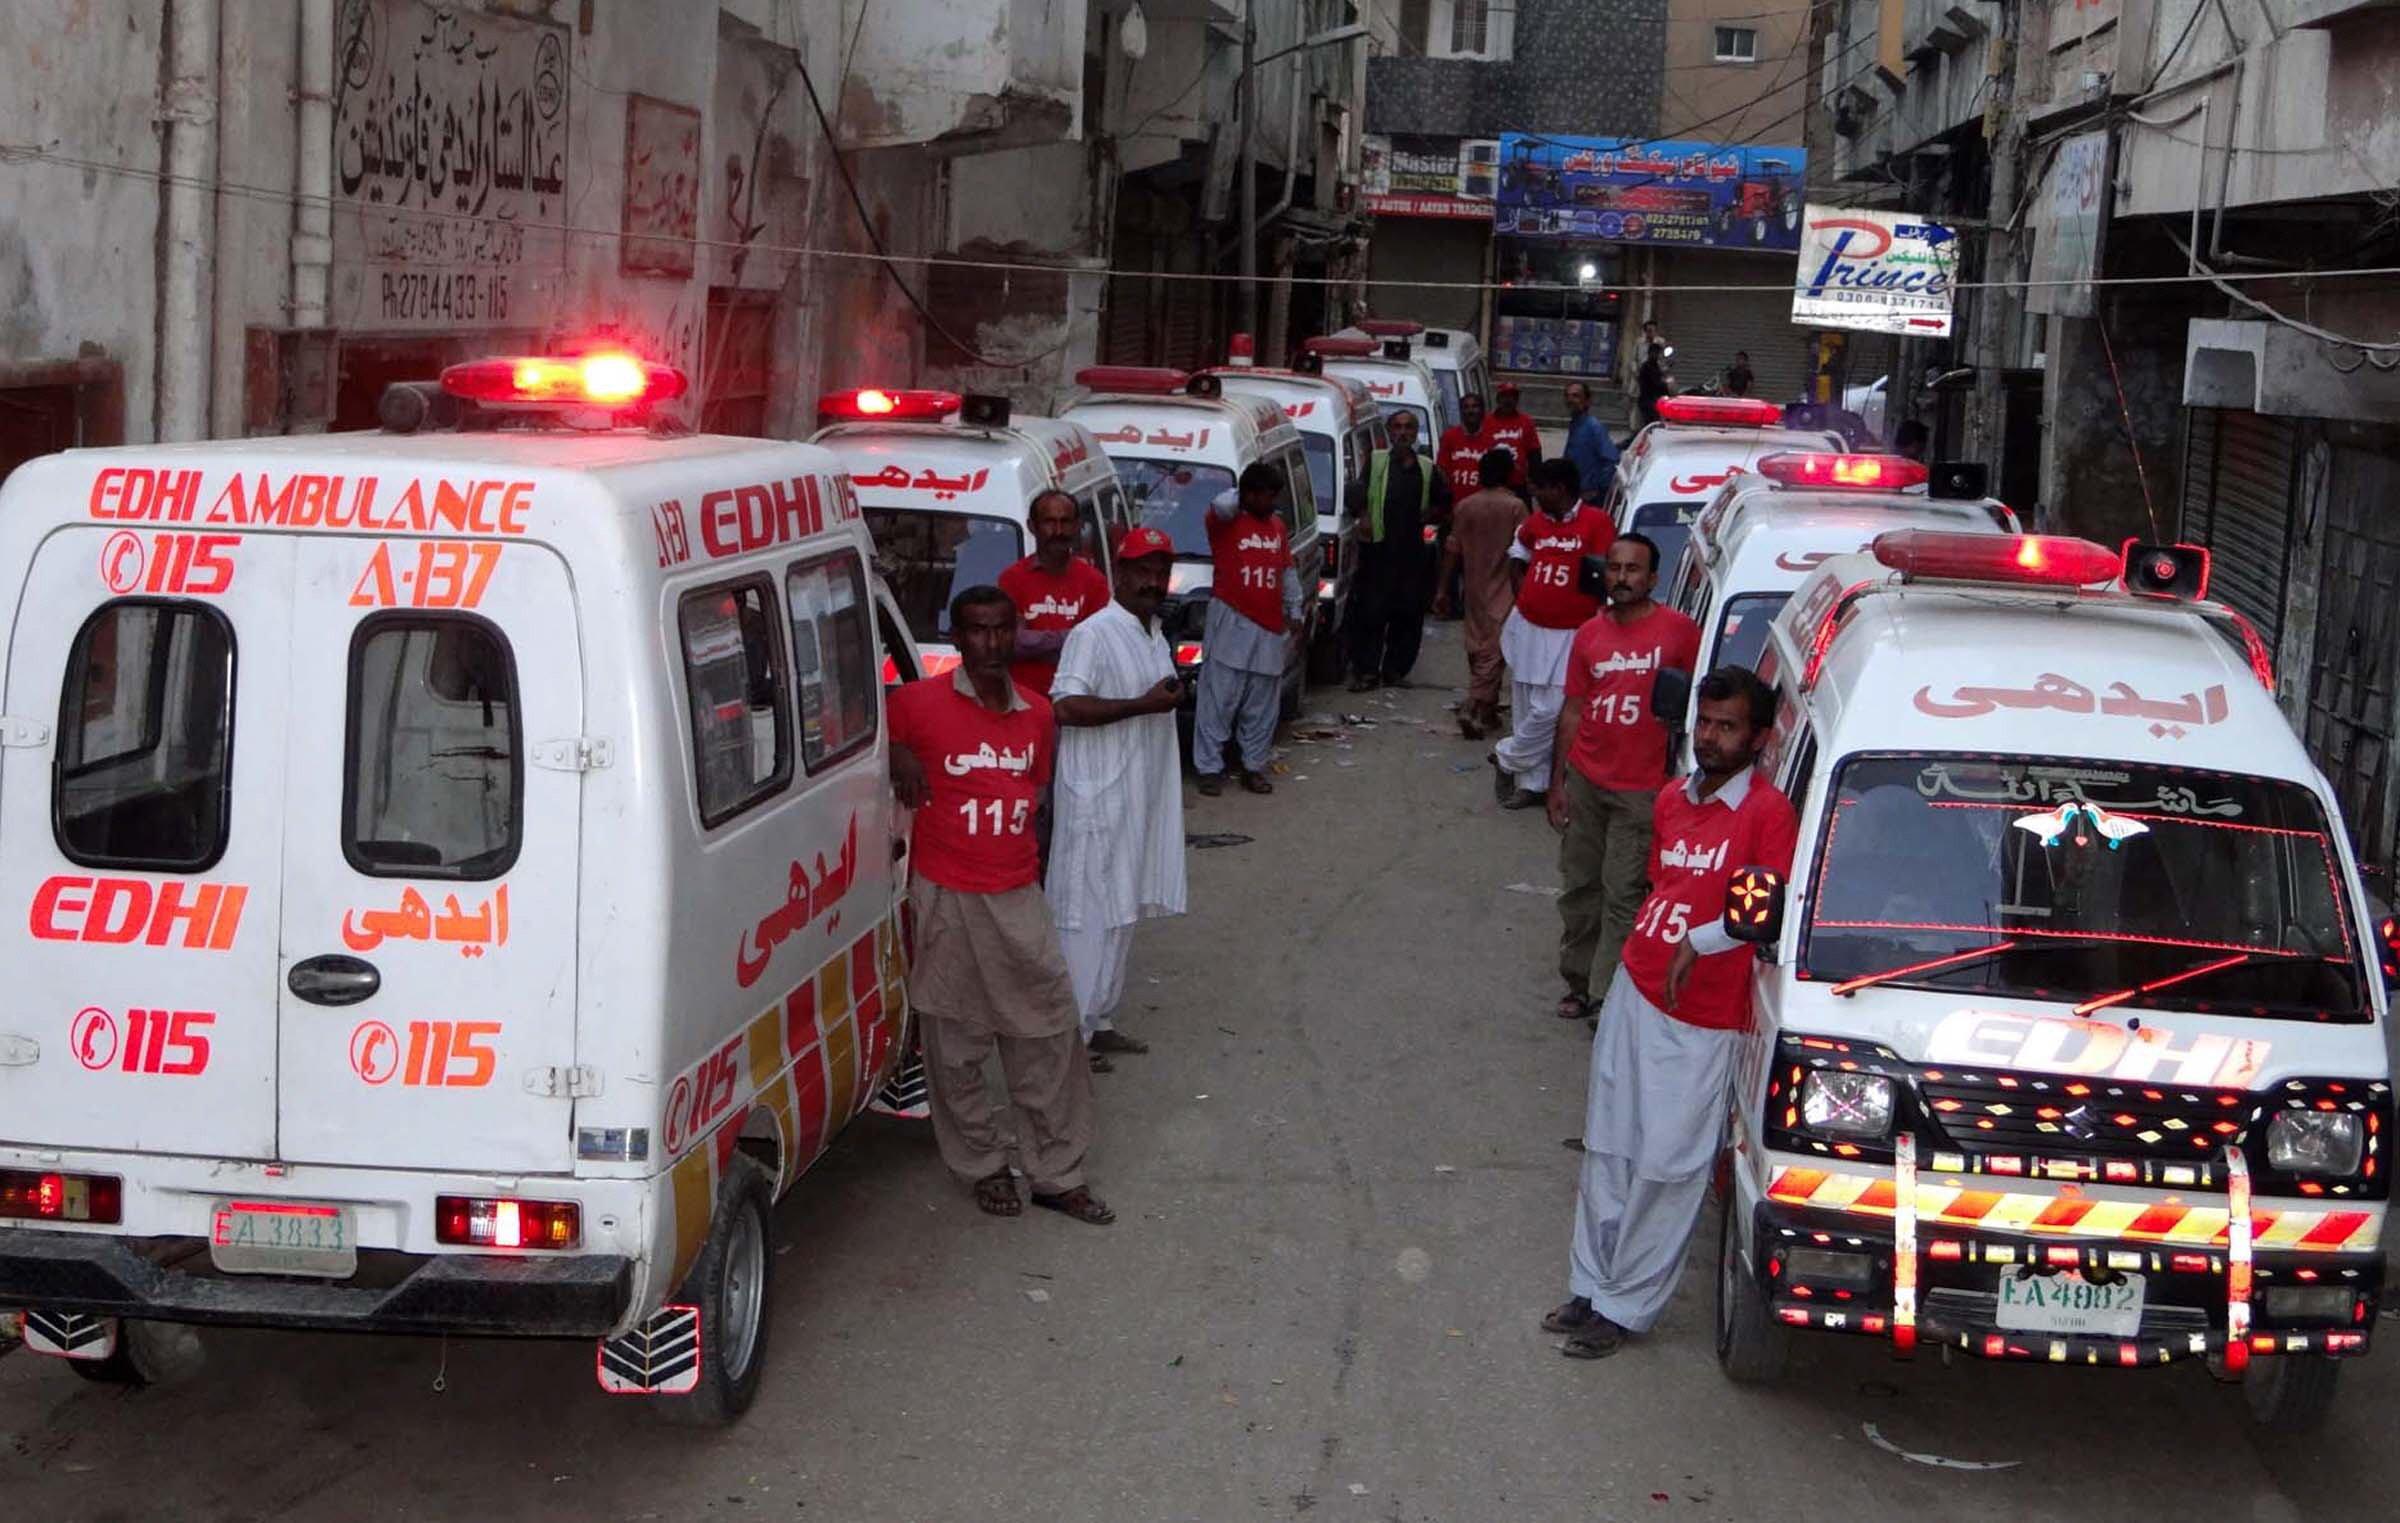 edhi ambulances to soon have trained paramedics on board